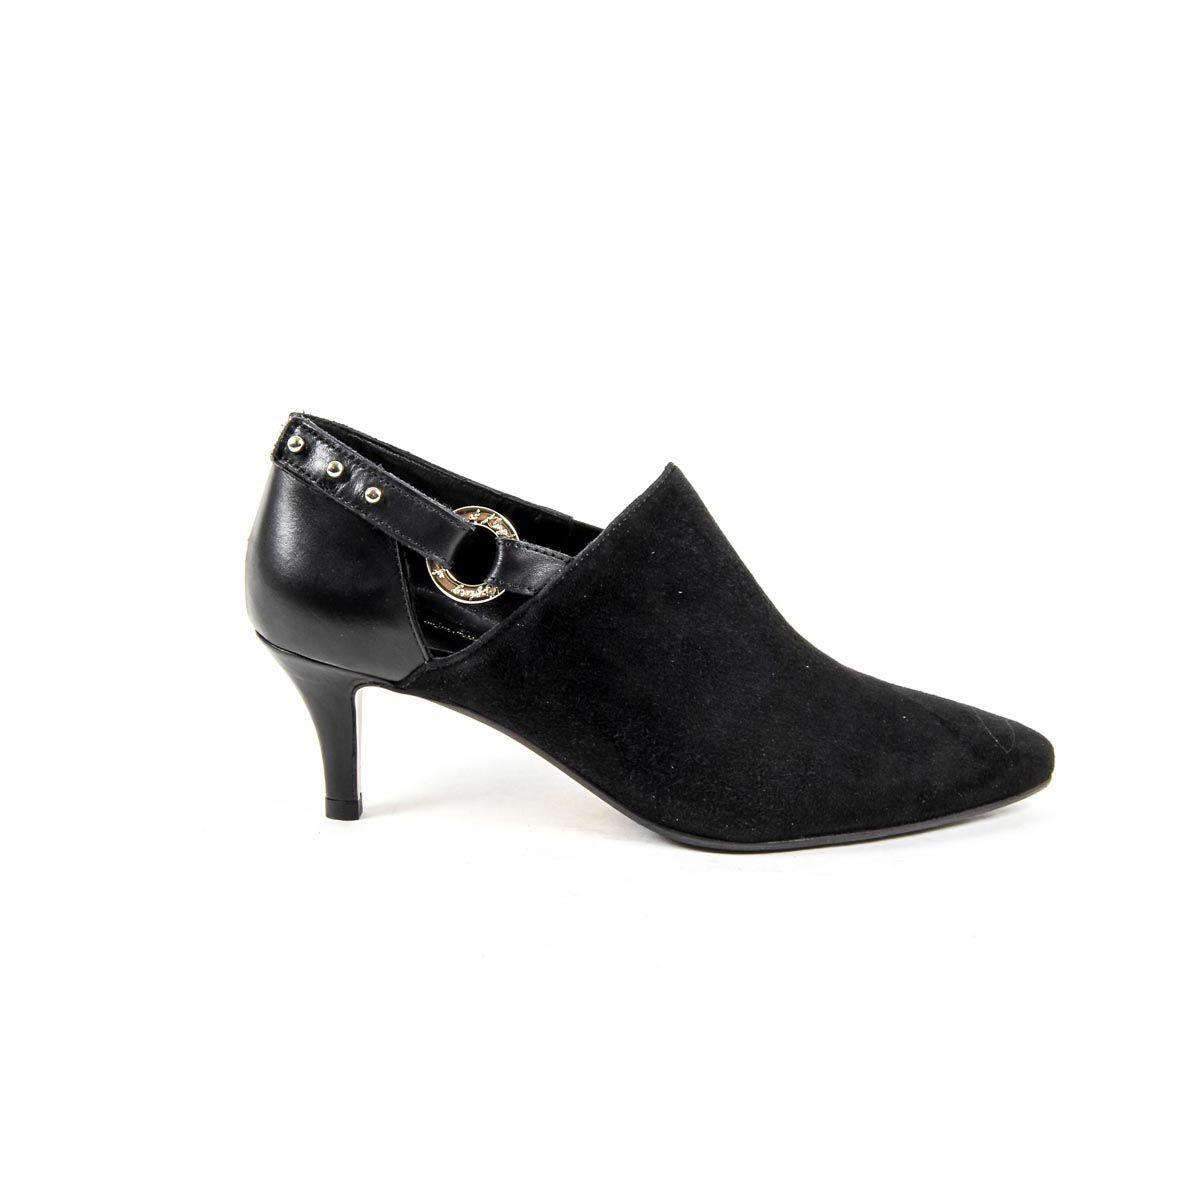 9a85fa62391 Versace 19.69 Abbigliamento Sportivo Srl Milano Italia Womens Heeled Shoe  KATE CAMOSCIO NERO